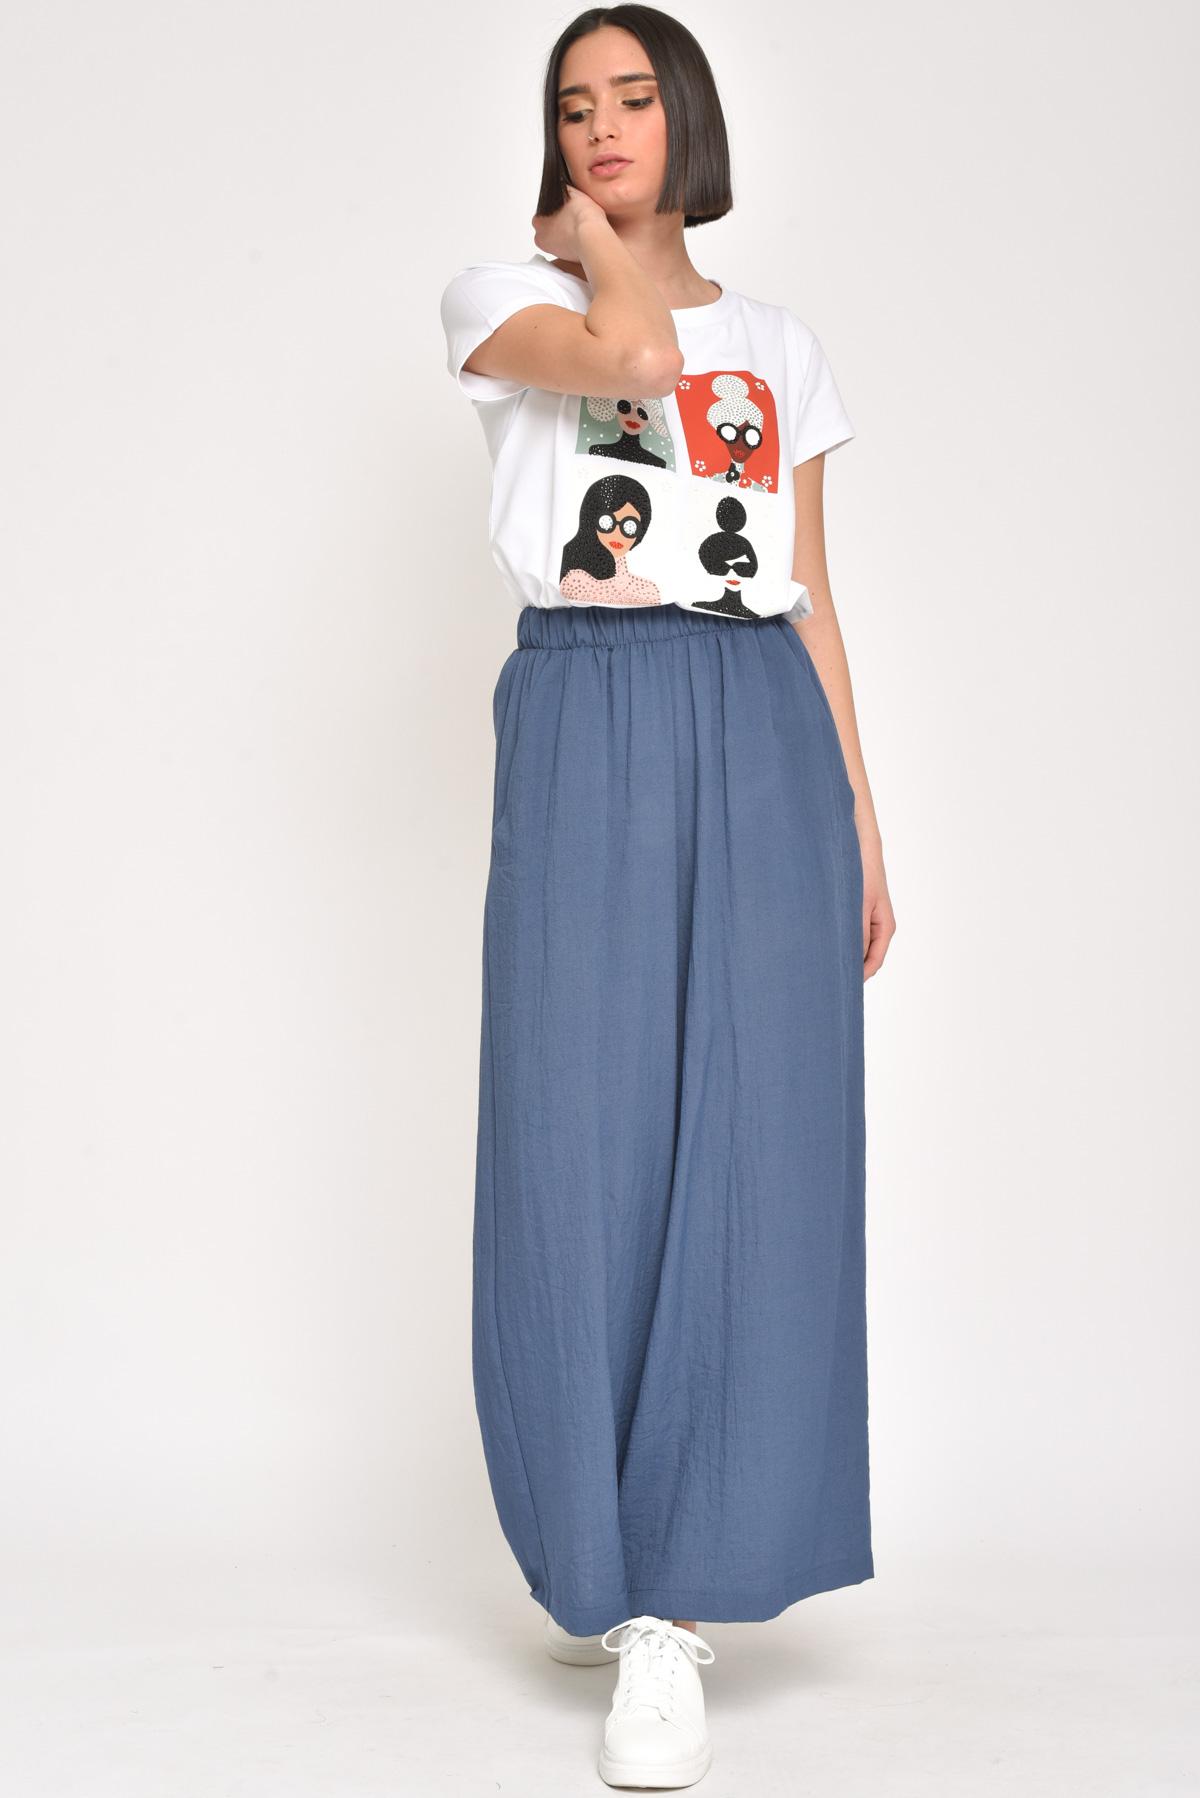 PANTALONI CROPPED IN VISCOSA for women - JEANS - Paquito Pronto Moda Shop Online